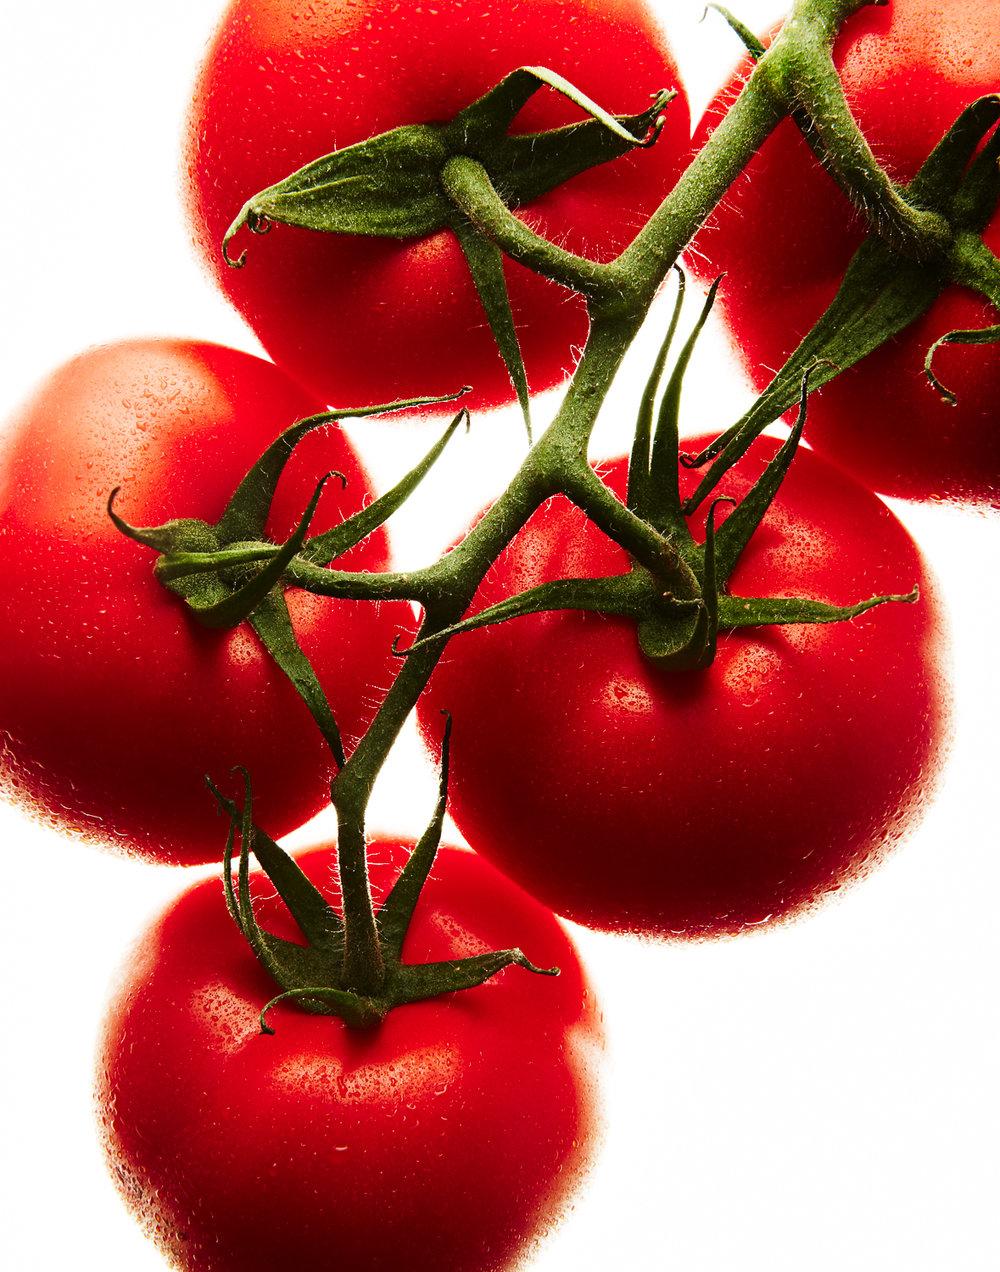 140709 Produce Tomato 0132.jpg